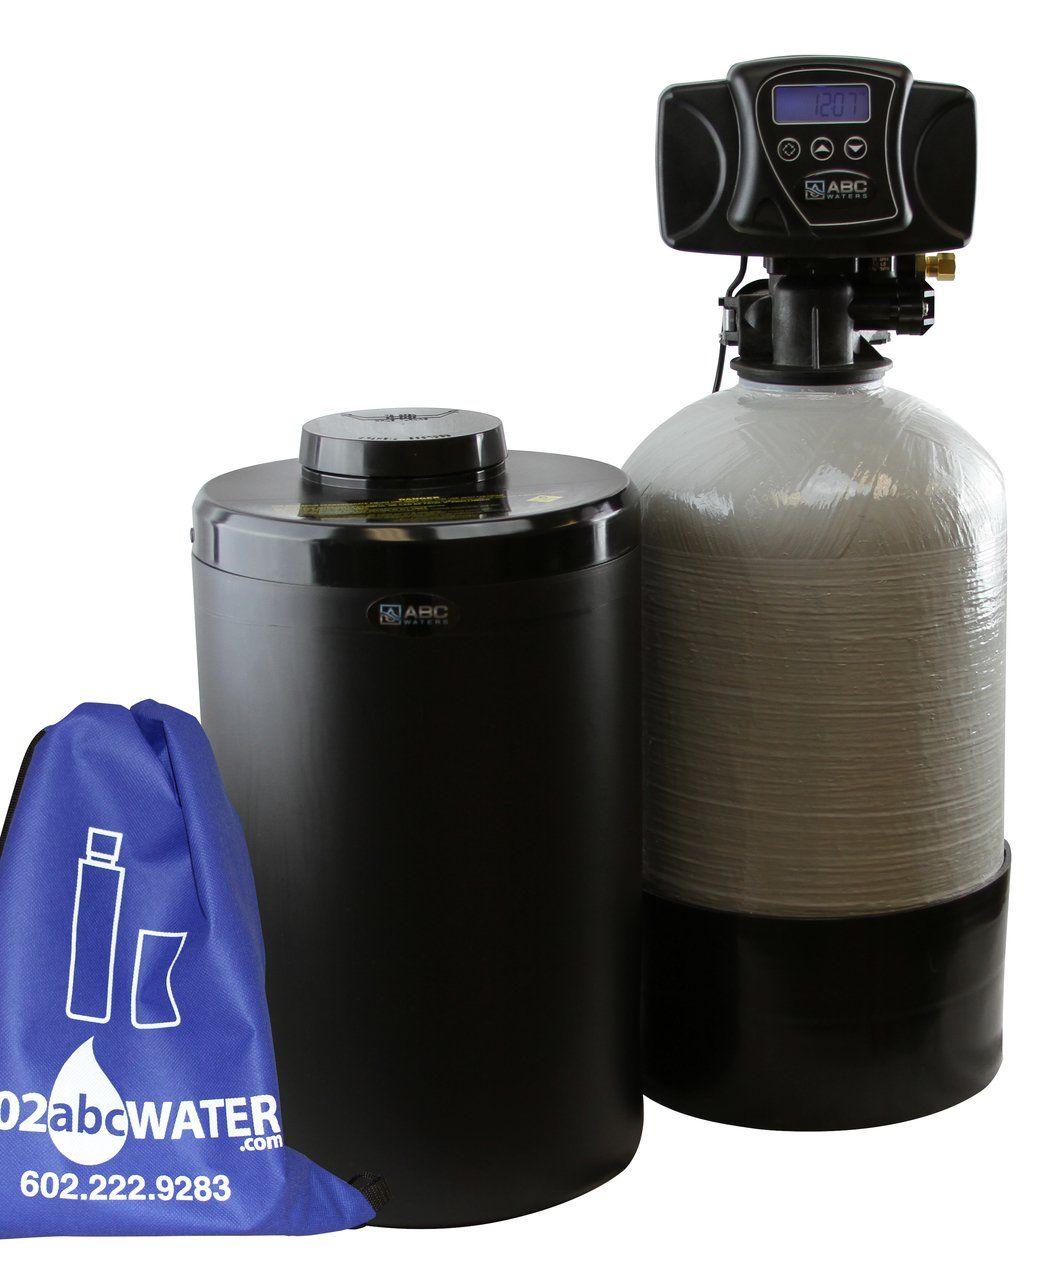 Fleck 5600sxt 16k Water Softener System